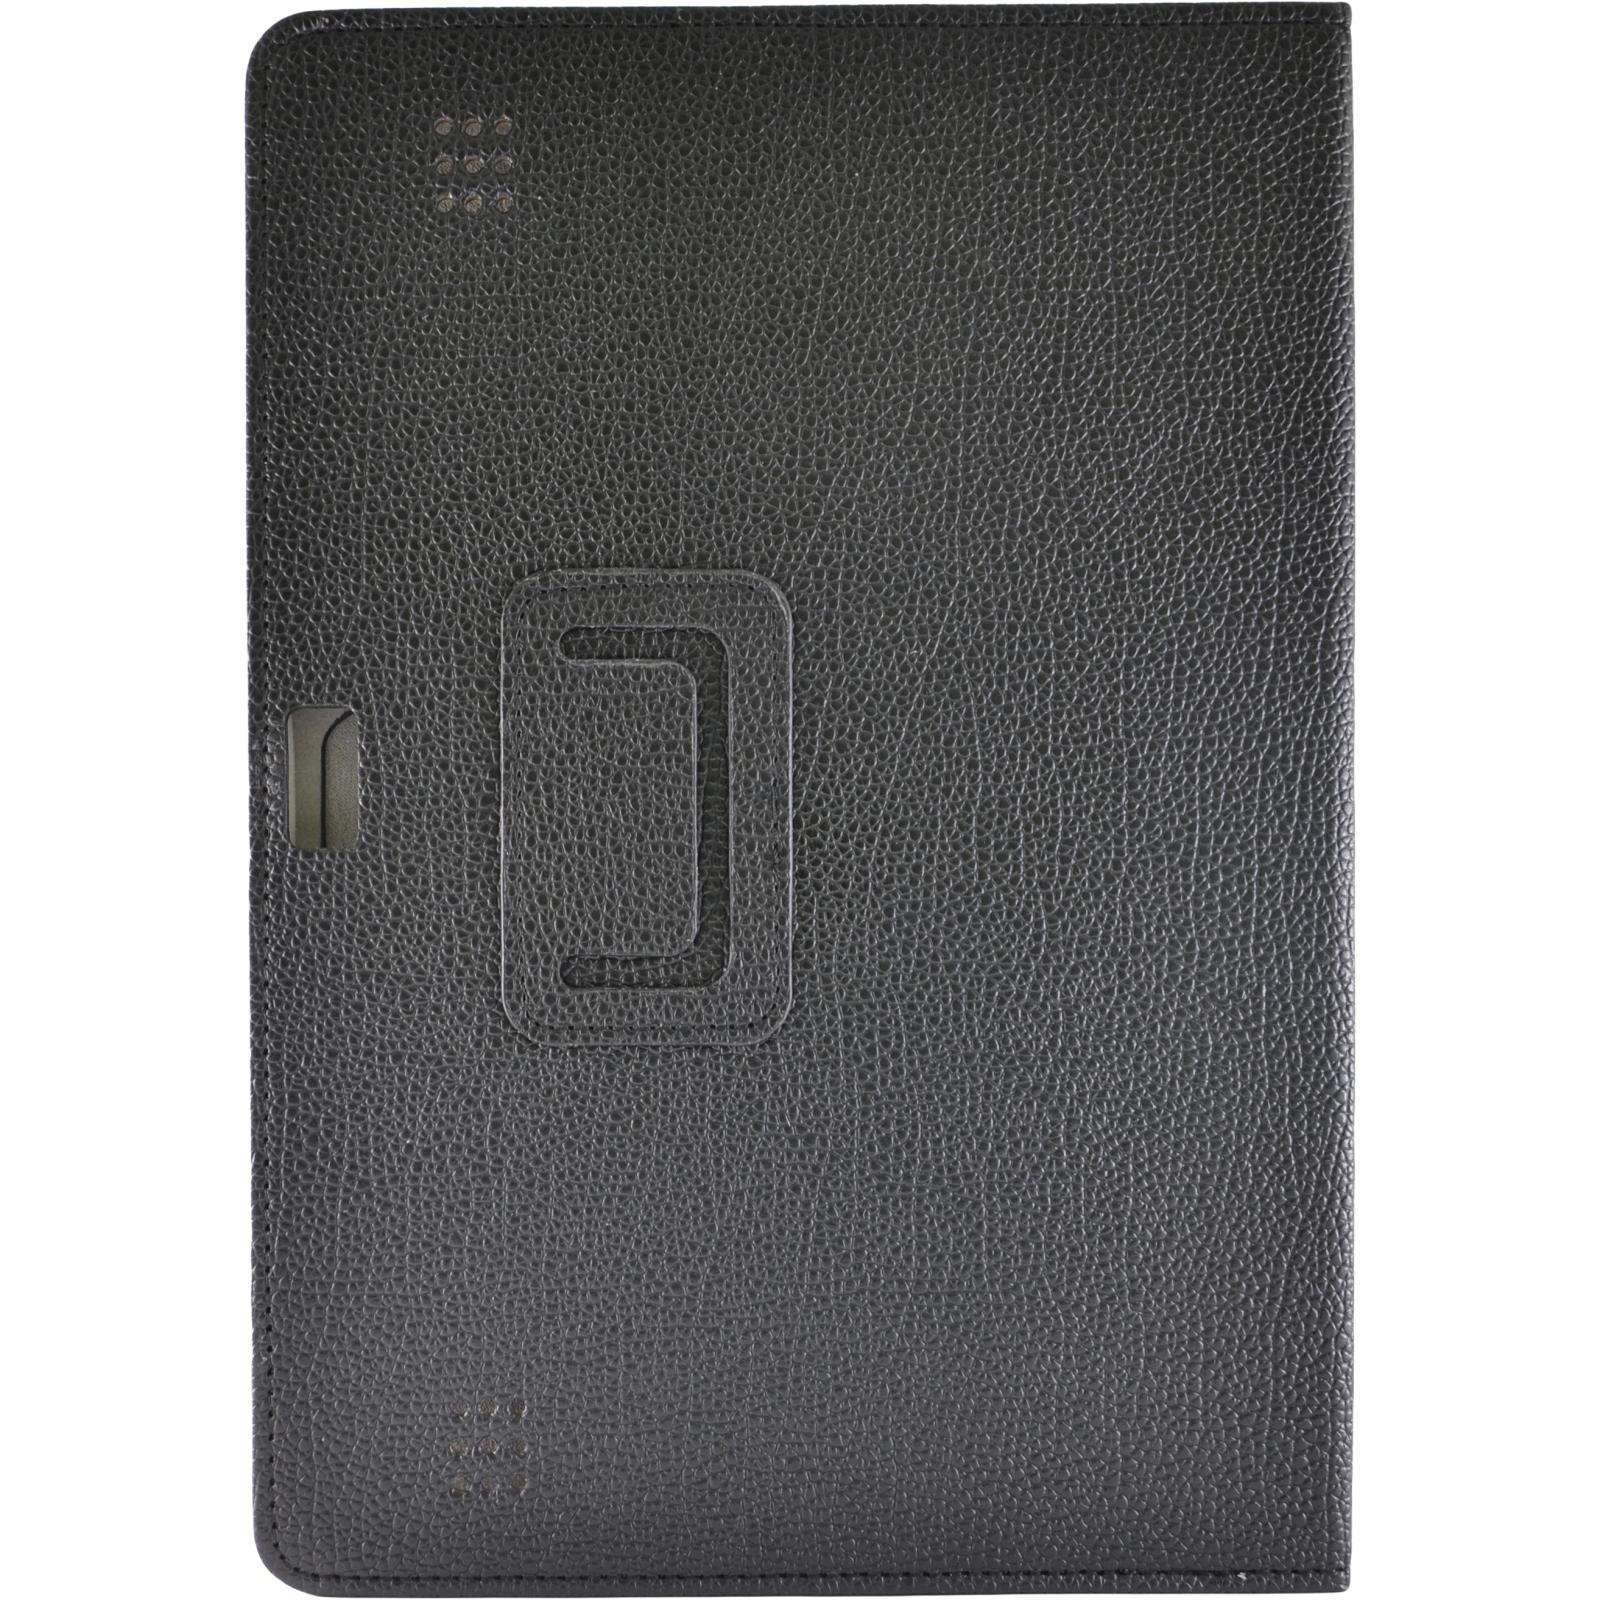 Чехол для планшета Pro-case Huawei MediaPad 10 Link S10-201u (HuawMP S10-201) изображение 2